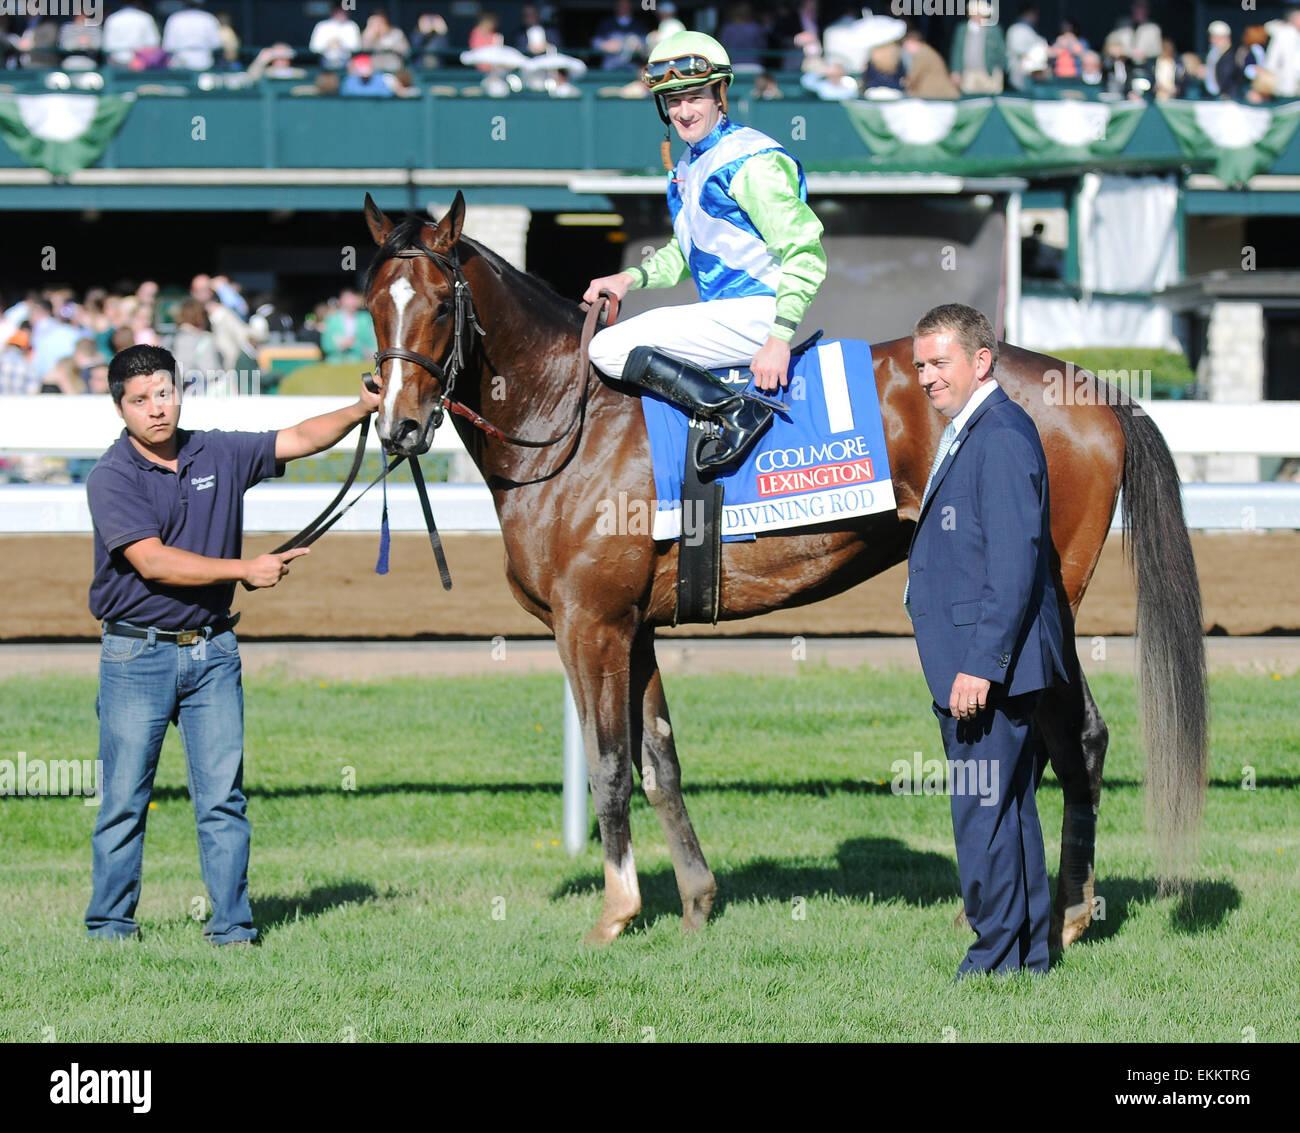 Lexington, KY, USA. 11th Apr, 2015. Divining Rod and jockey Julien Leparoux win the Coolmore Lexington at Keeneland Stock Photo